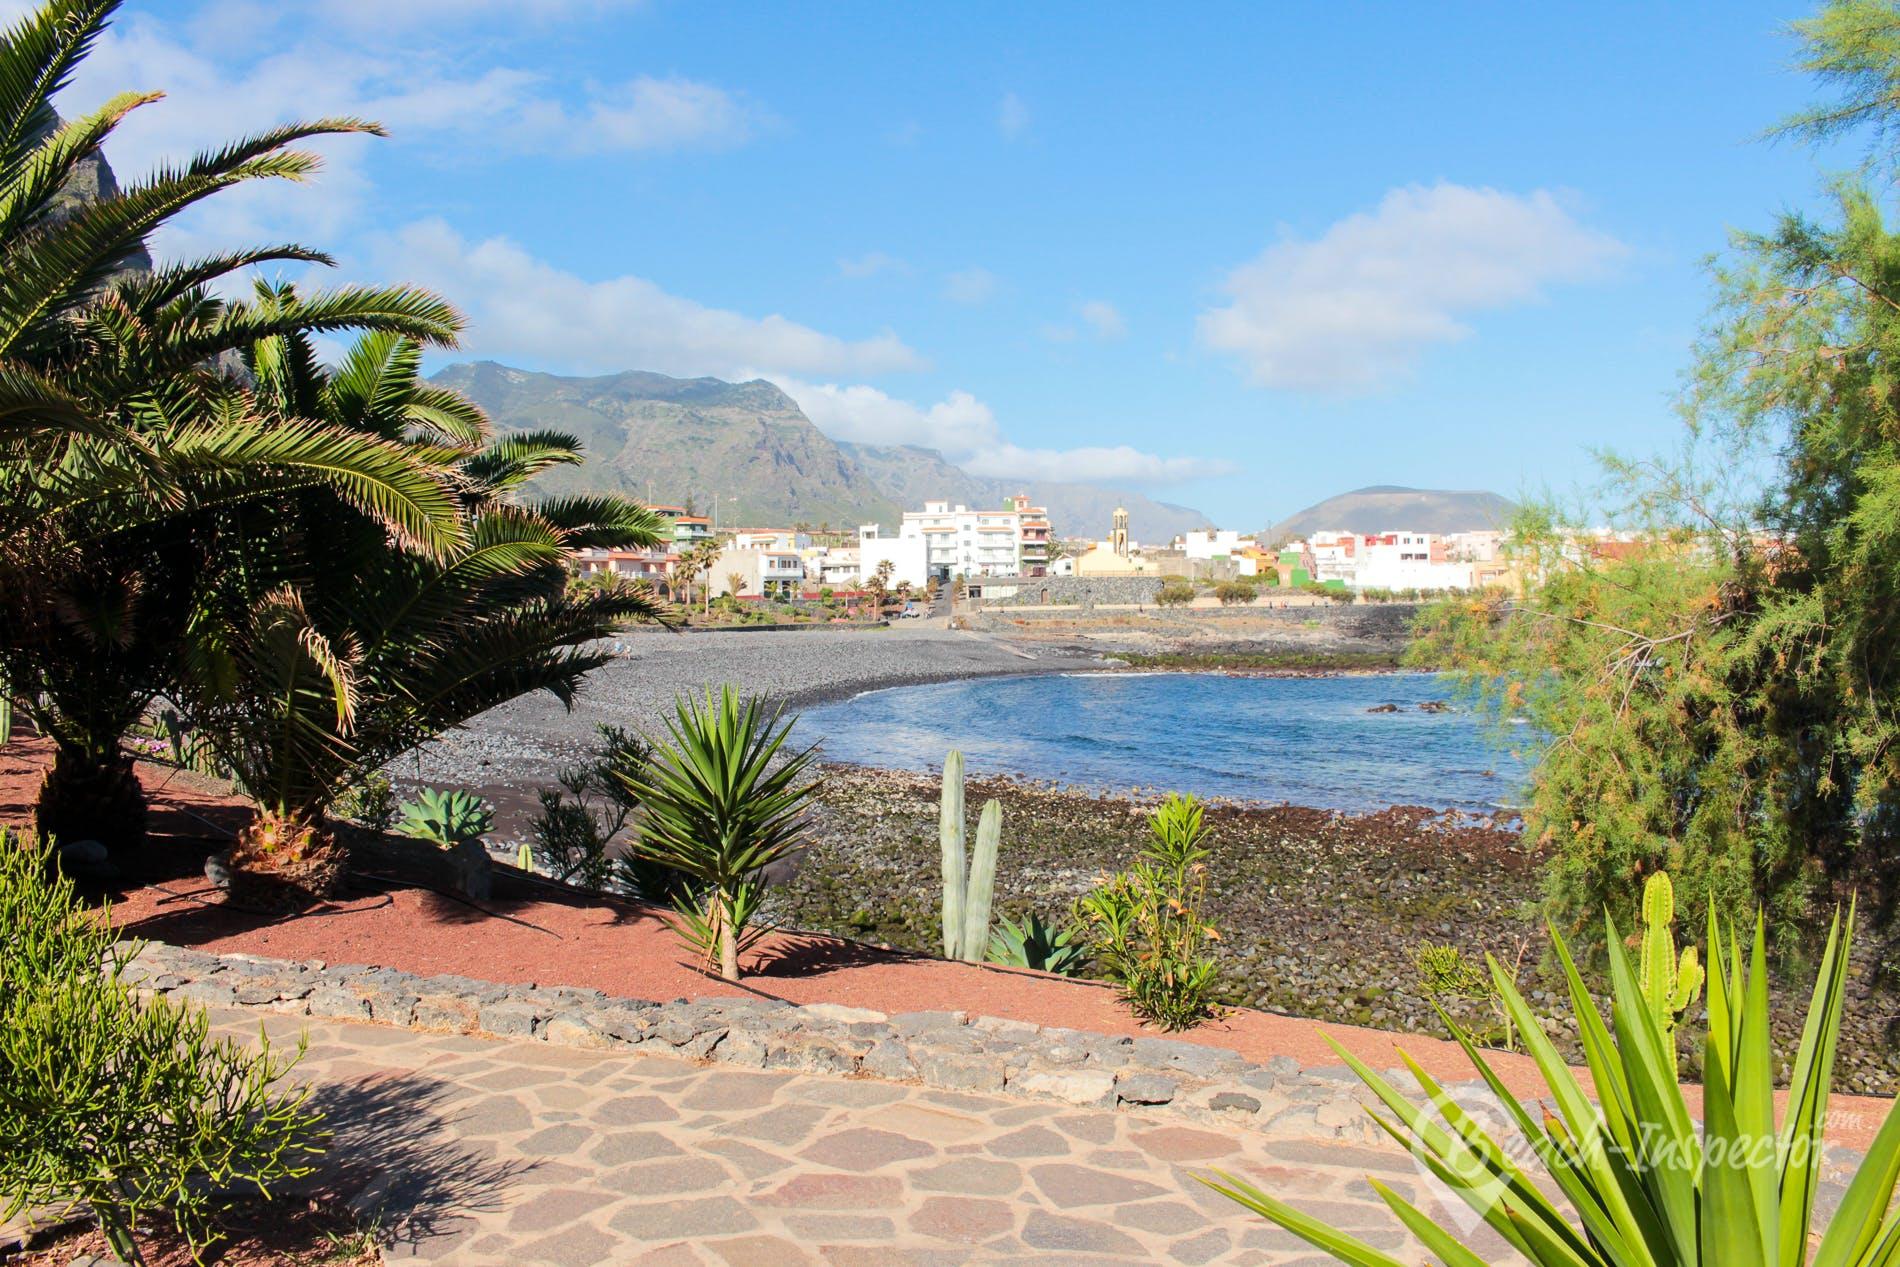 Beach Playa de la Caleta, Tenerife, Spain